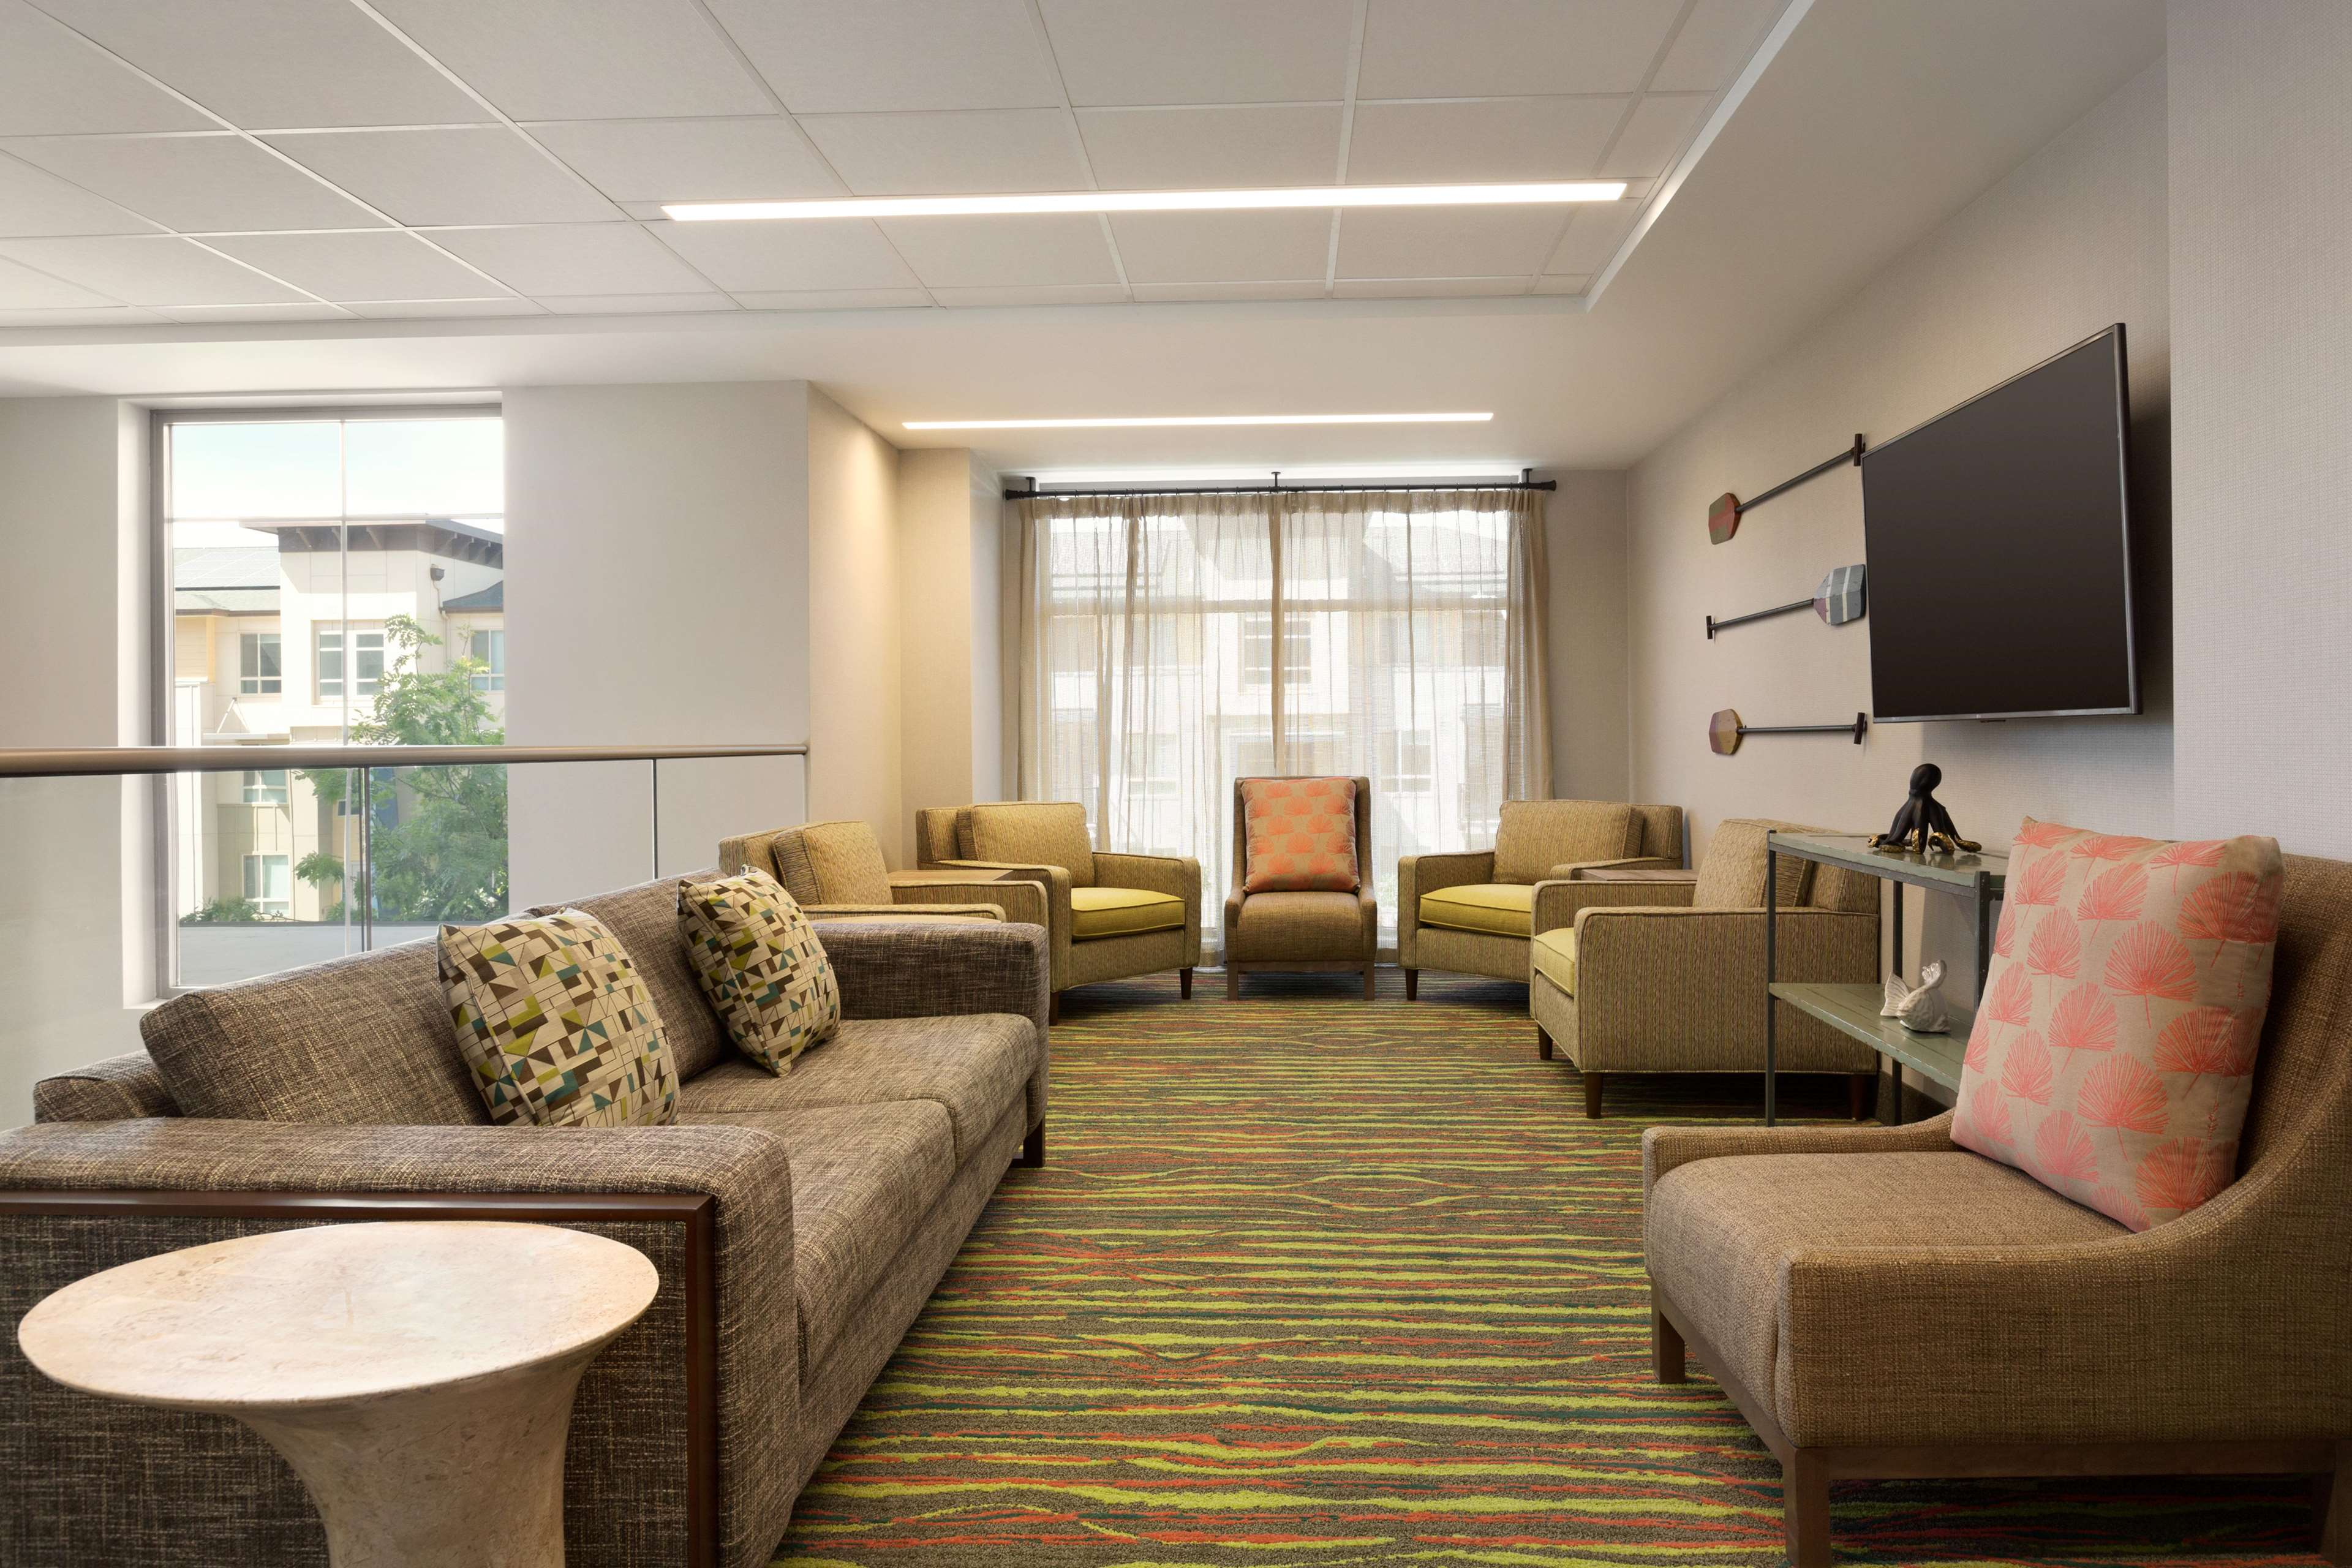 Embassy Suites by Hilton Oahu Kapolei image 7